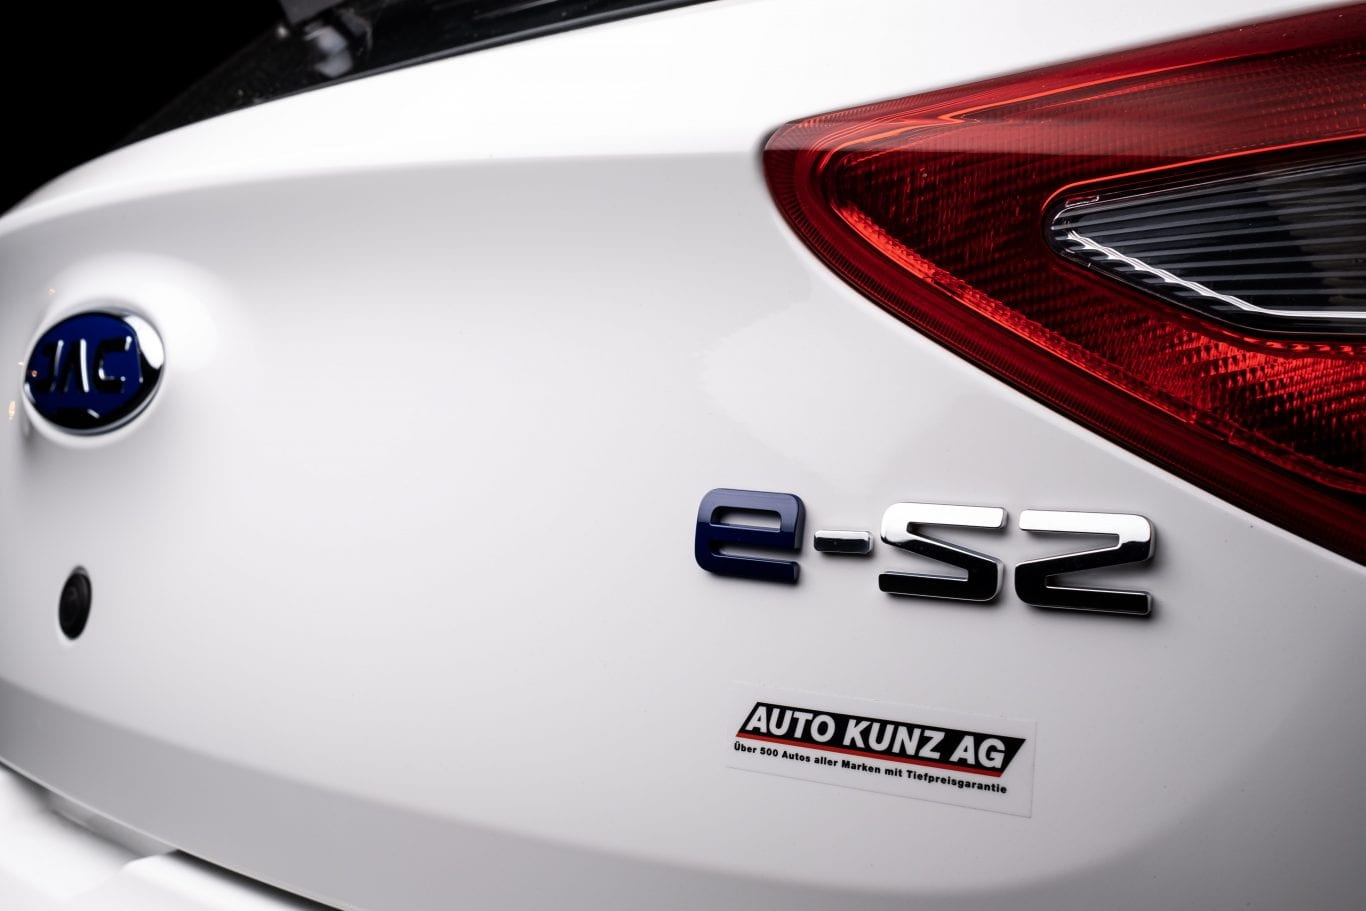 JAC – Auto Kunz ist offiziell neuer Generalimporteur - Auto Kunz AG 4